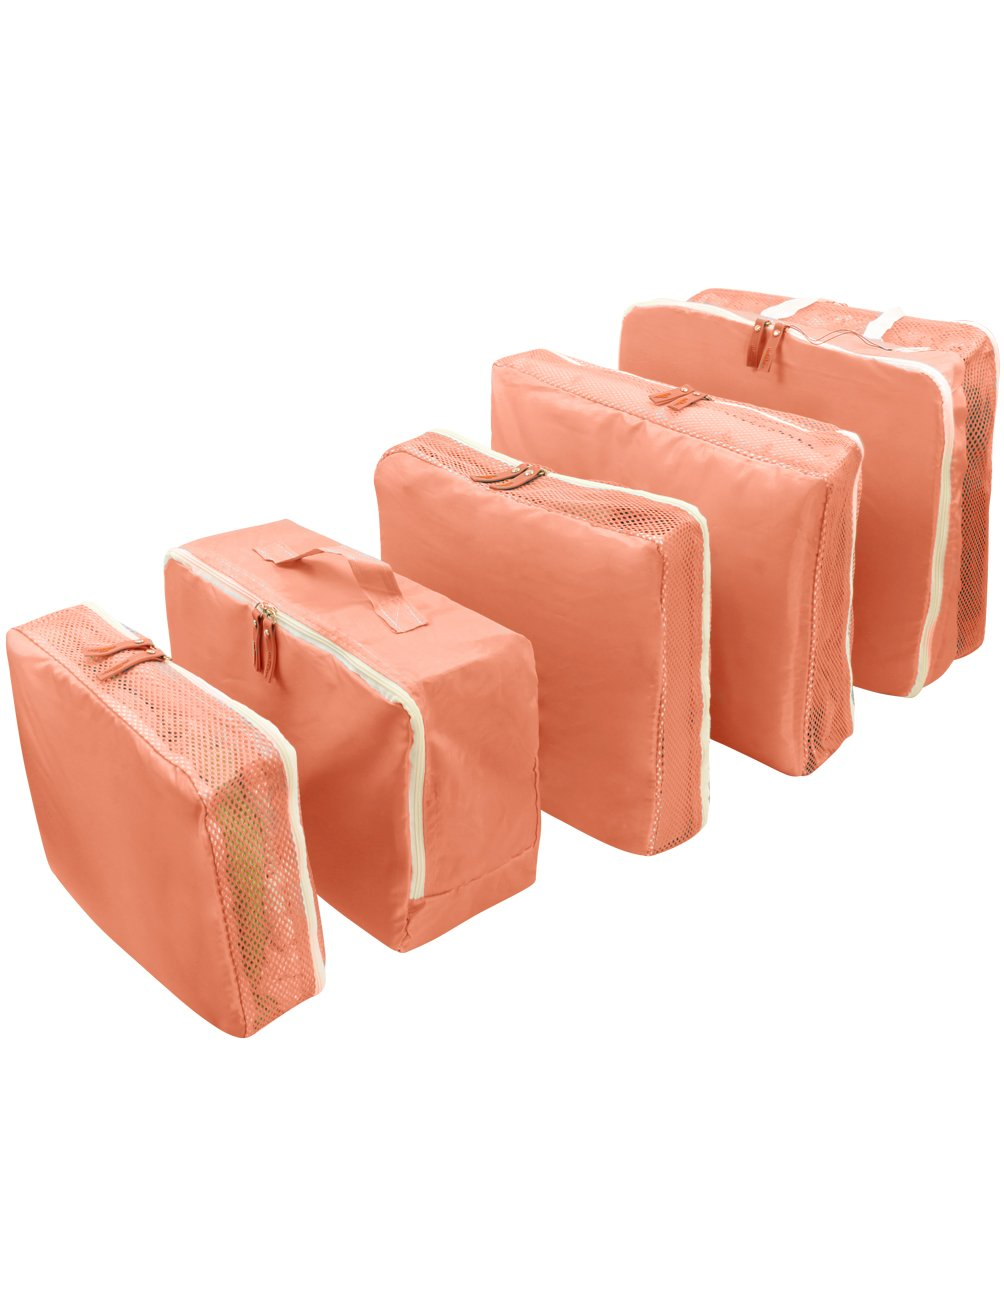 Easy Travel Quintuple Travel Luggage Packing Organizer Bag Set (5 Pcs) - Peach by Dahlia (Image #1)